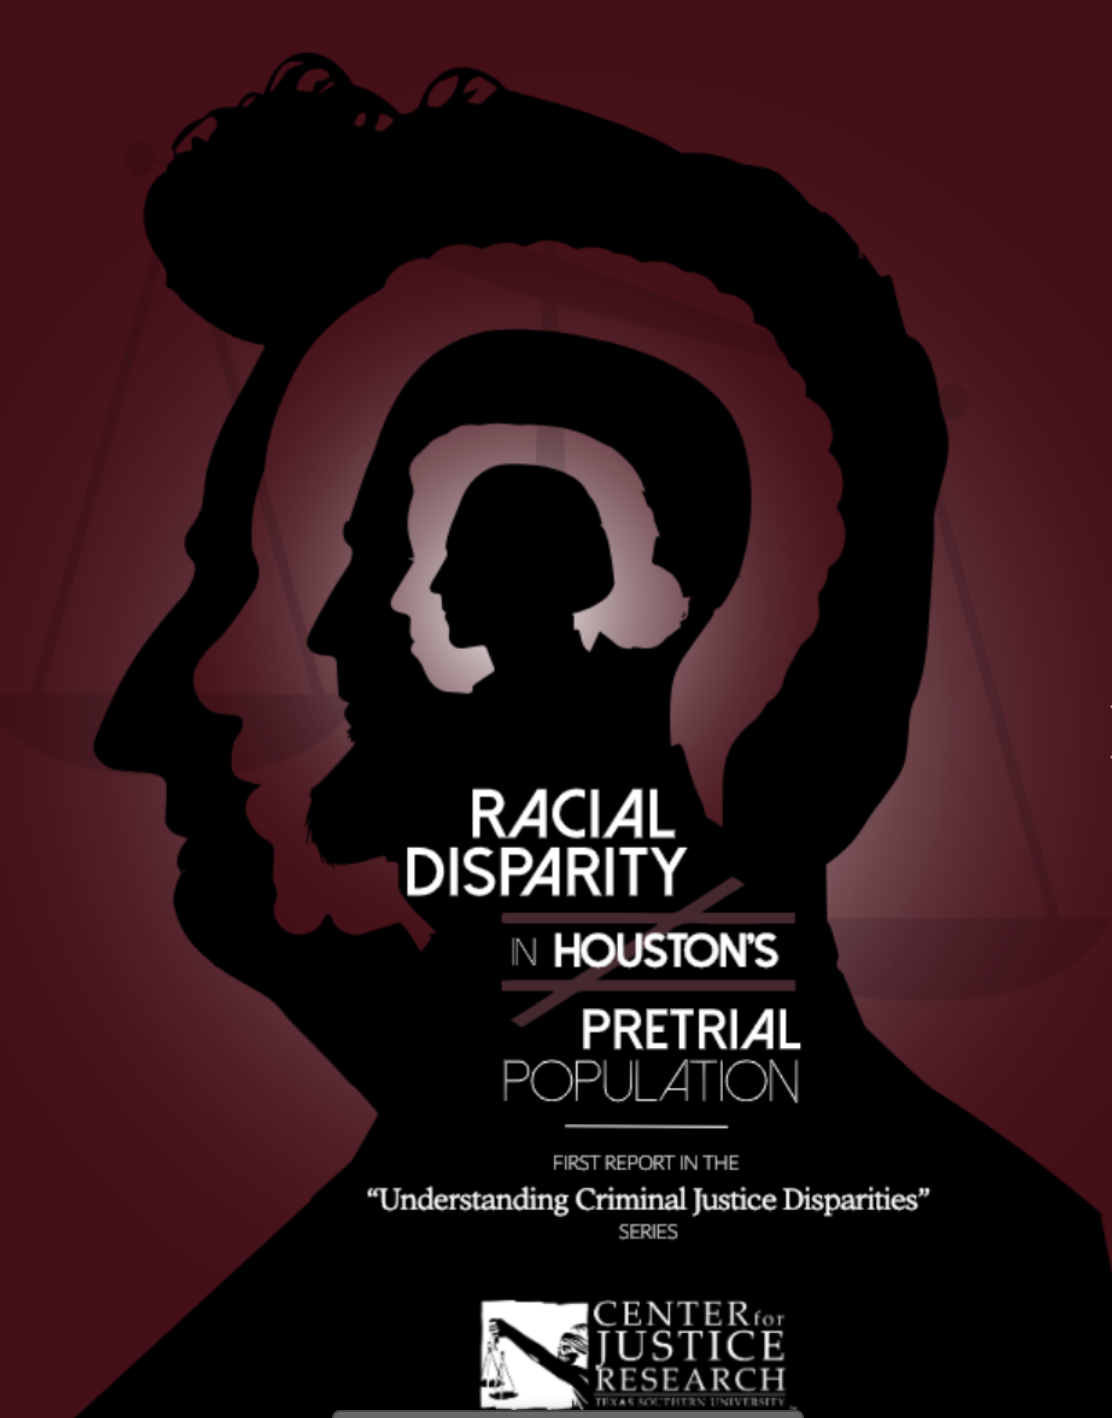 Racial Disparity in Houston's Pretrial Population